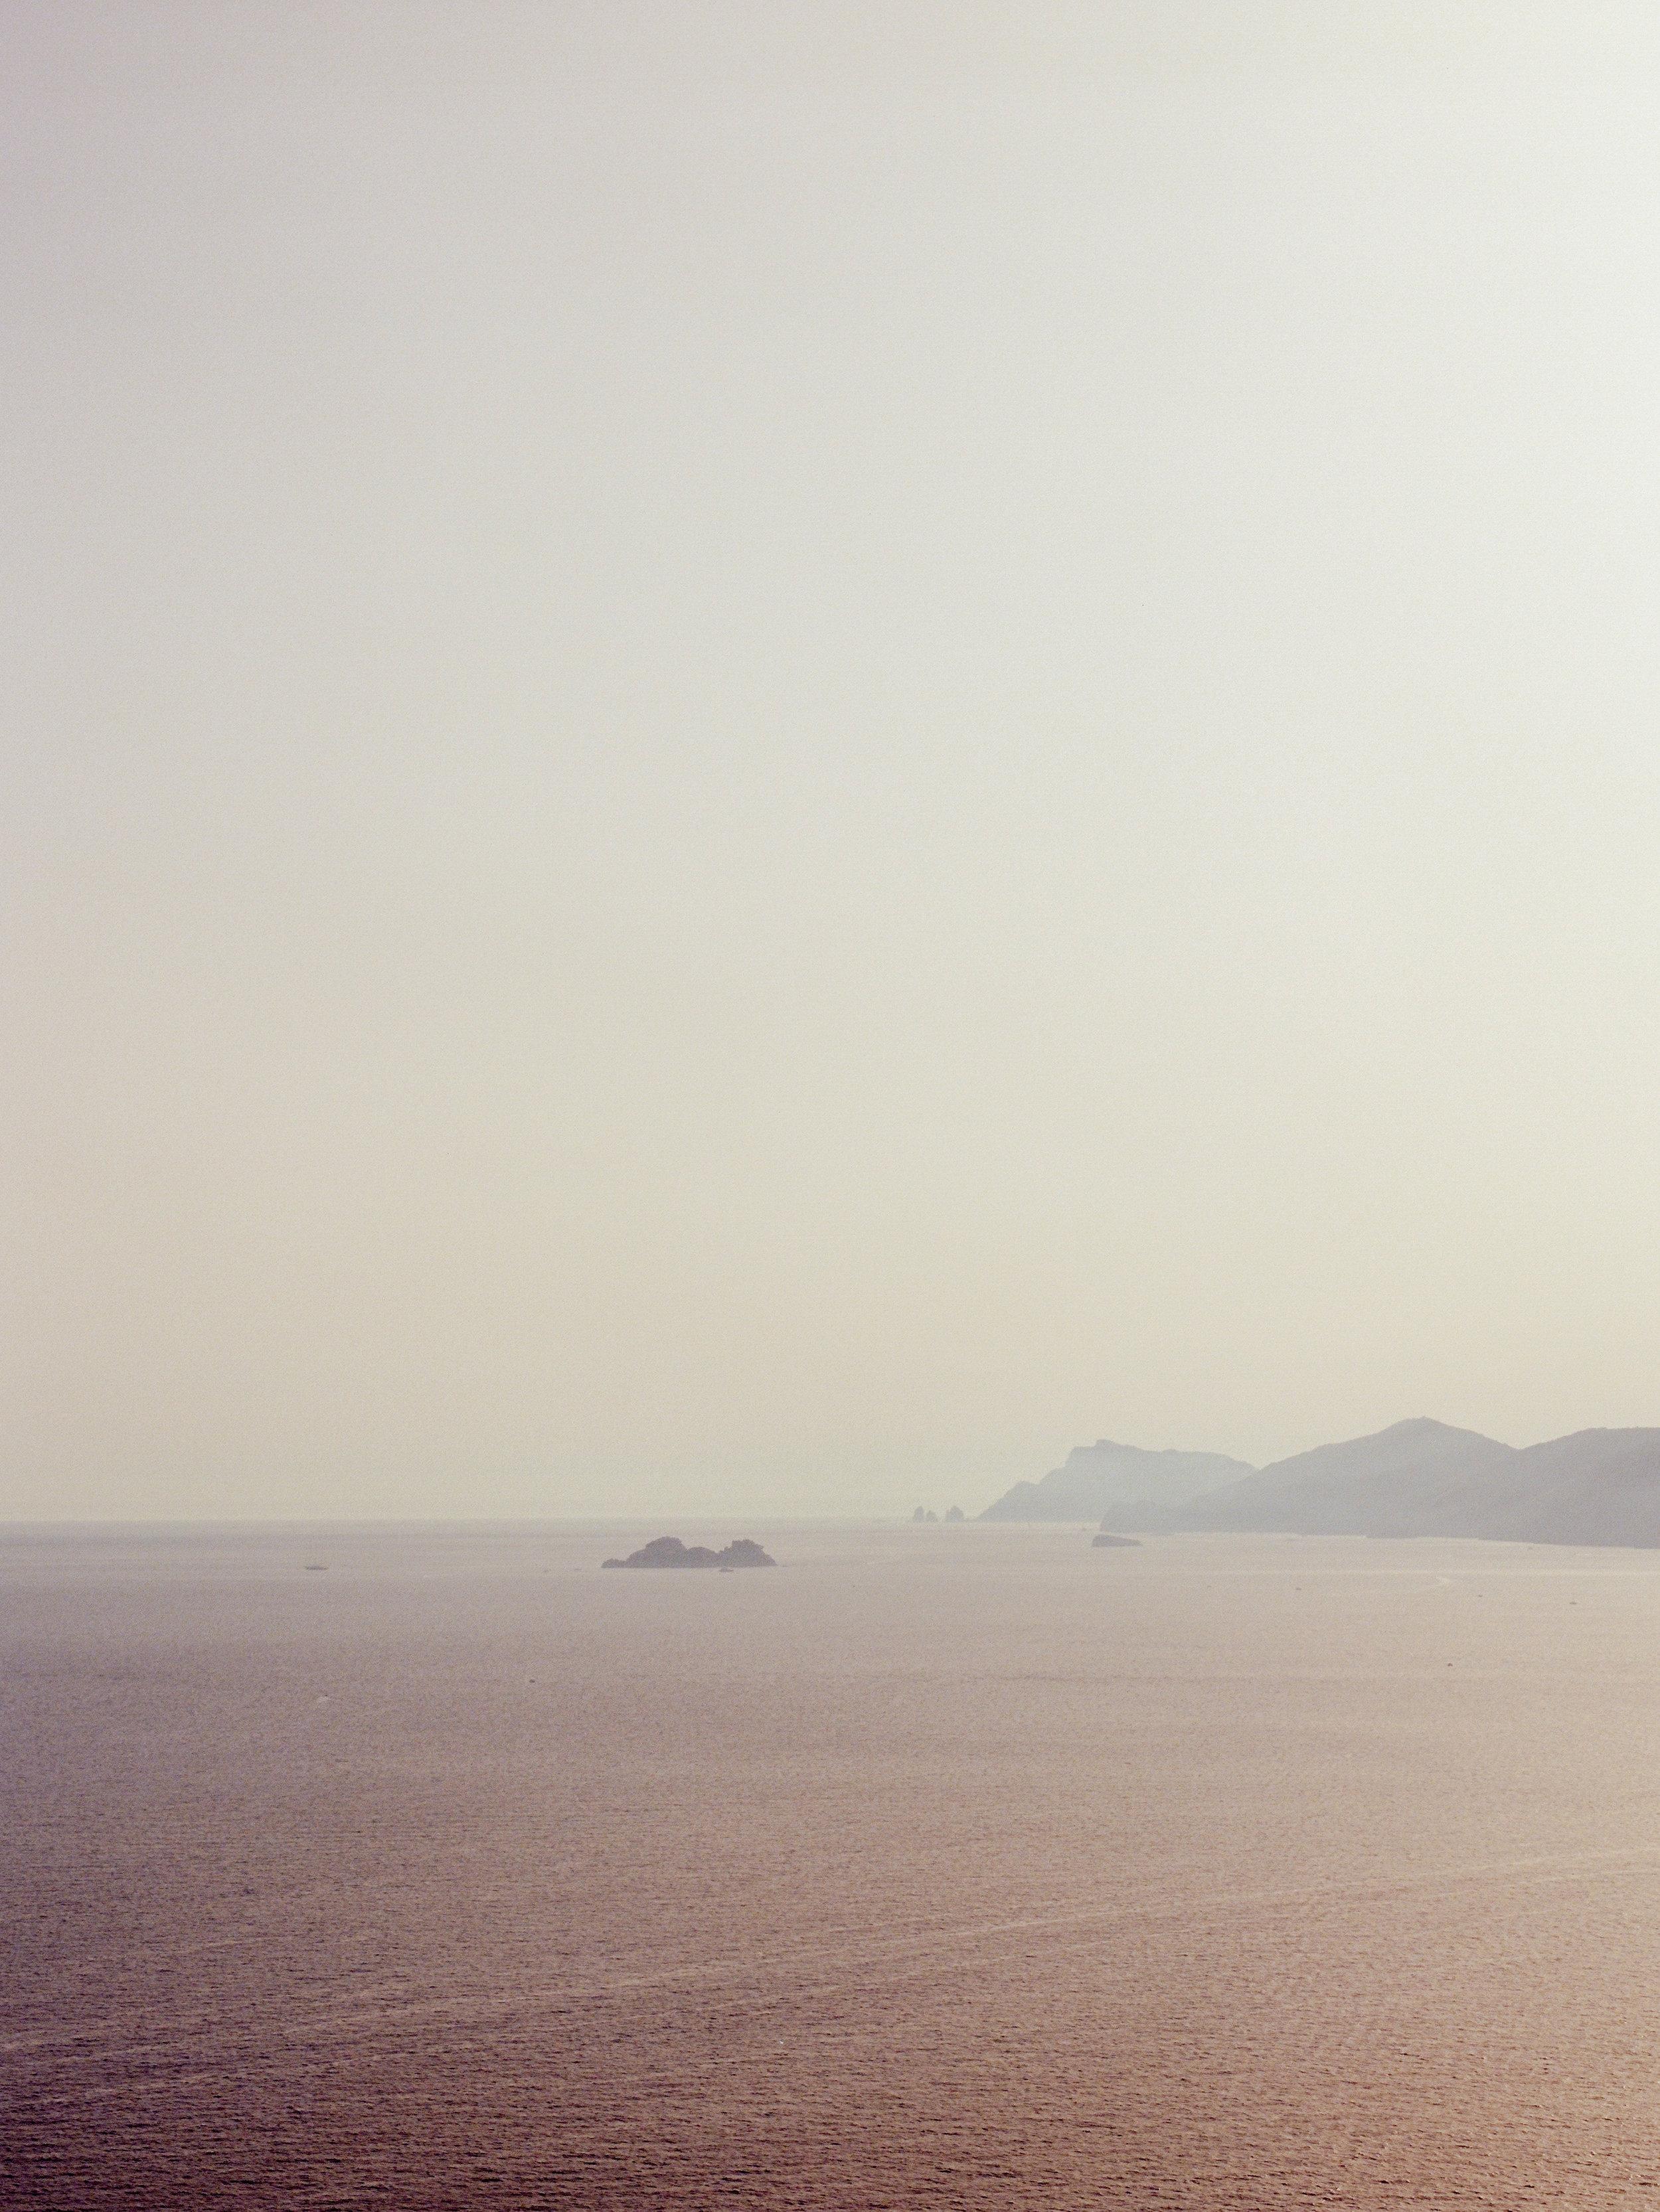 italy-destination-photographer-shannon-griffin-28.jpg